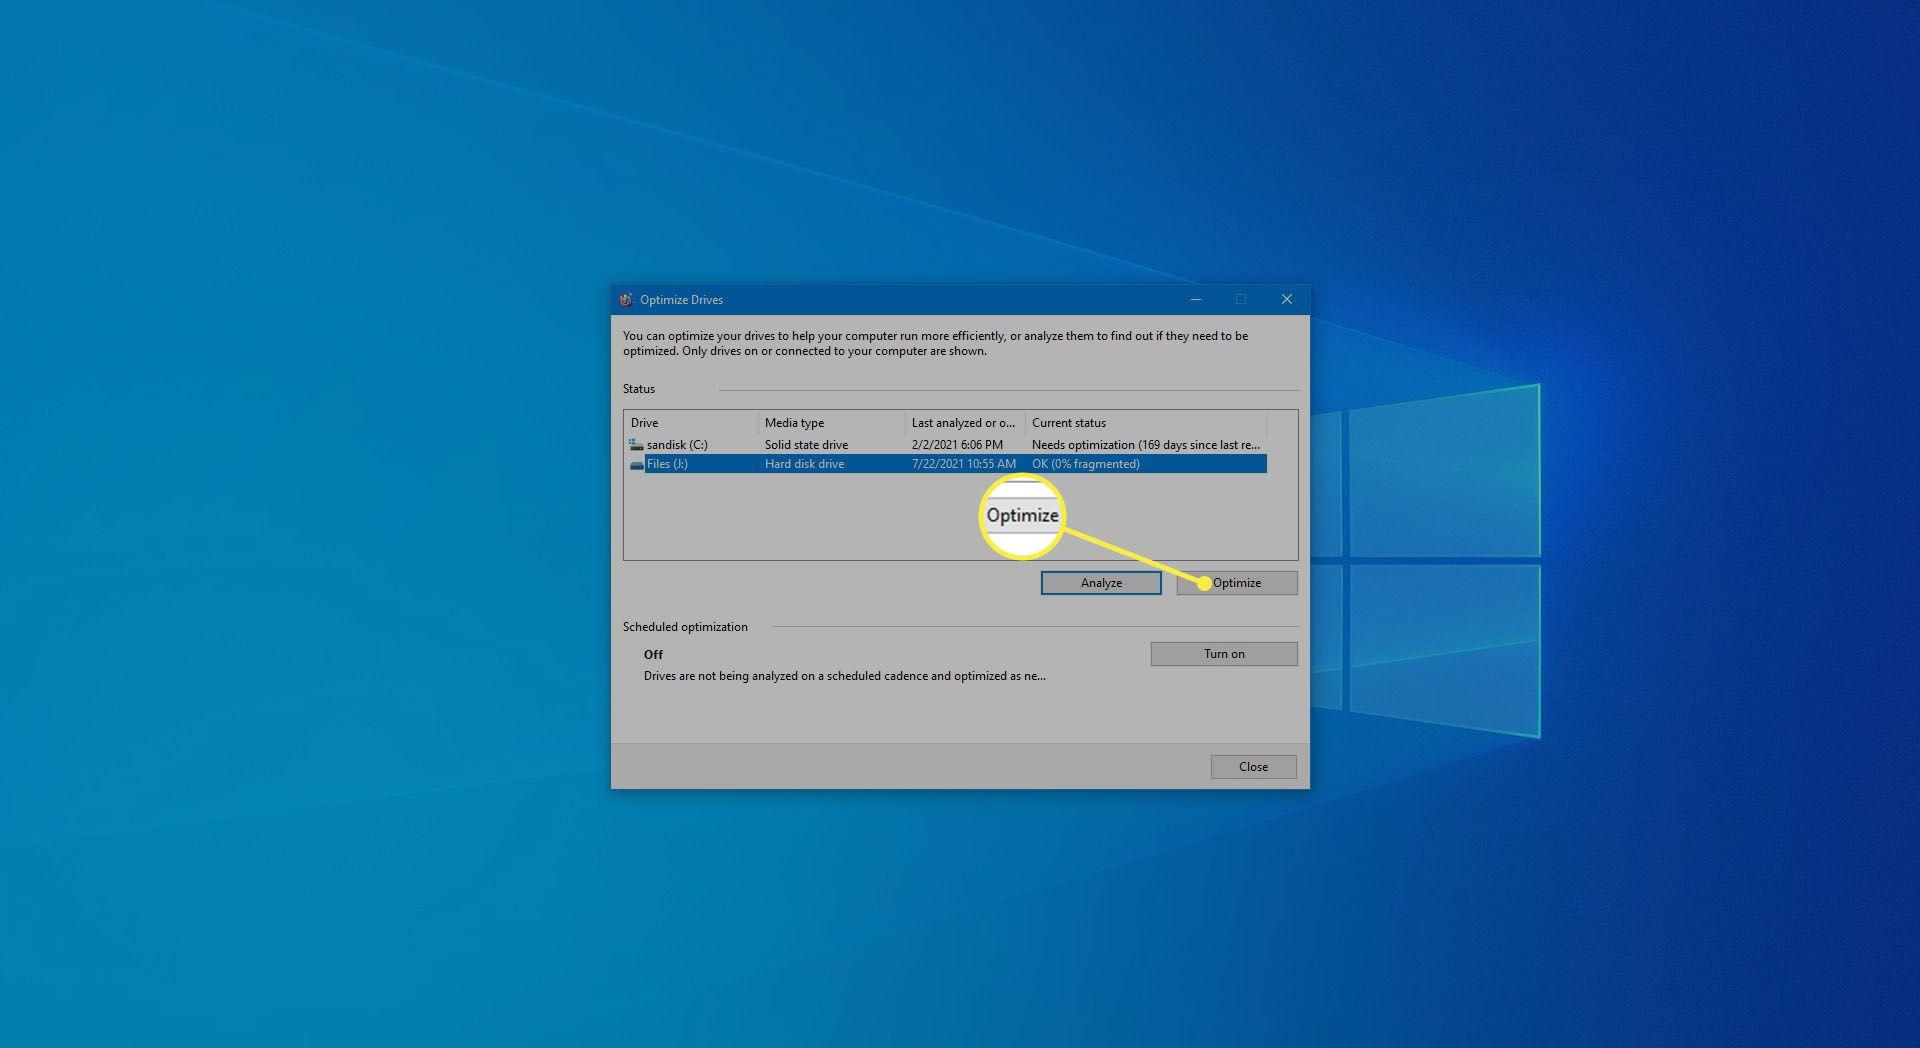 Selecting Optimize to begin hard drive defrag.